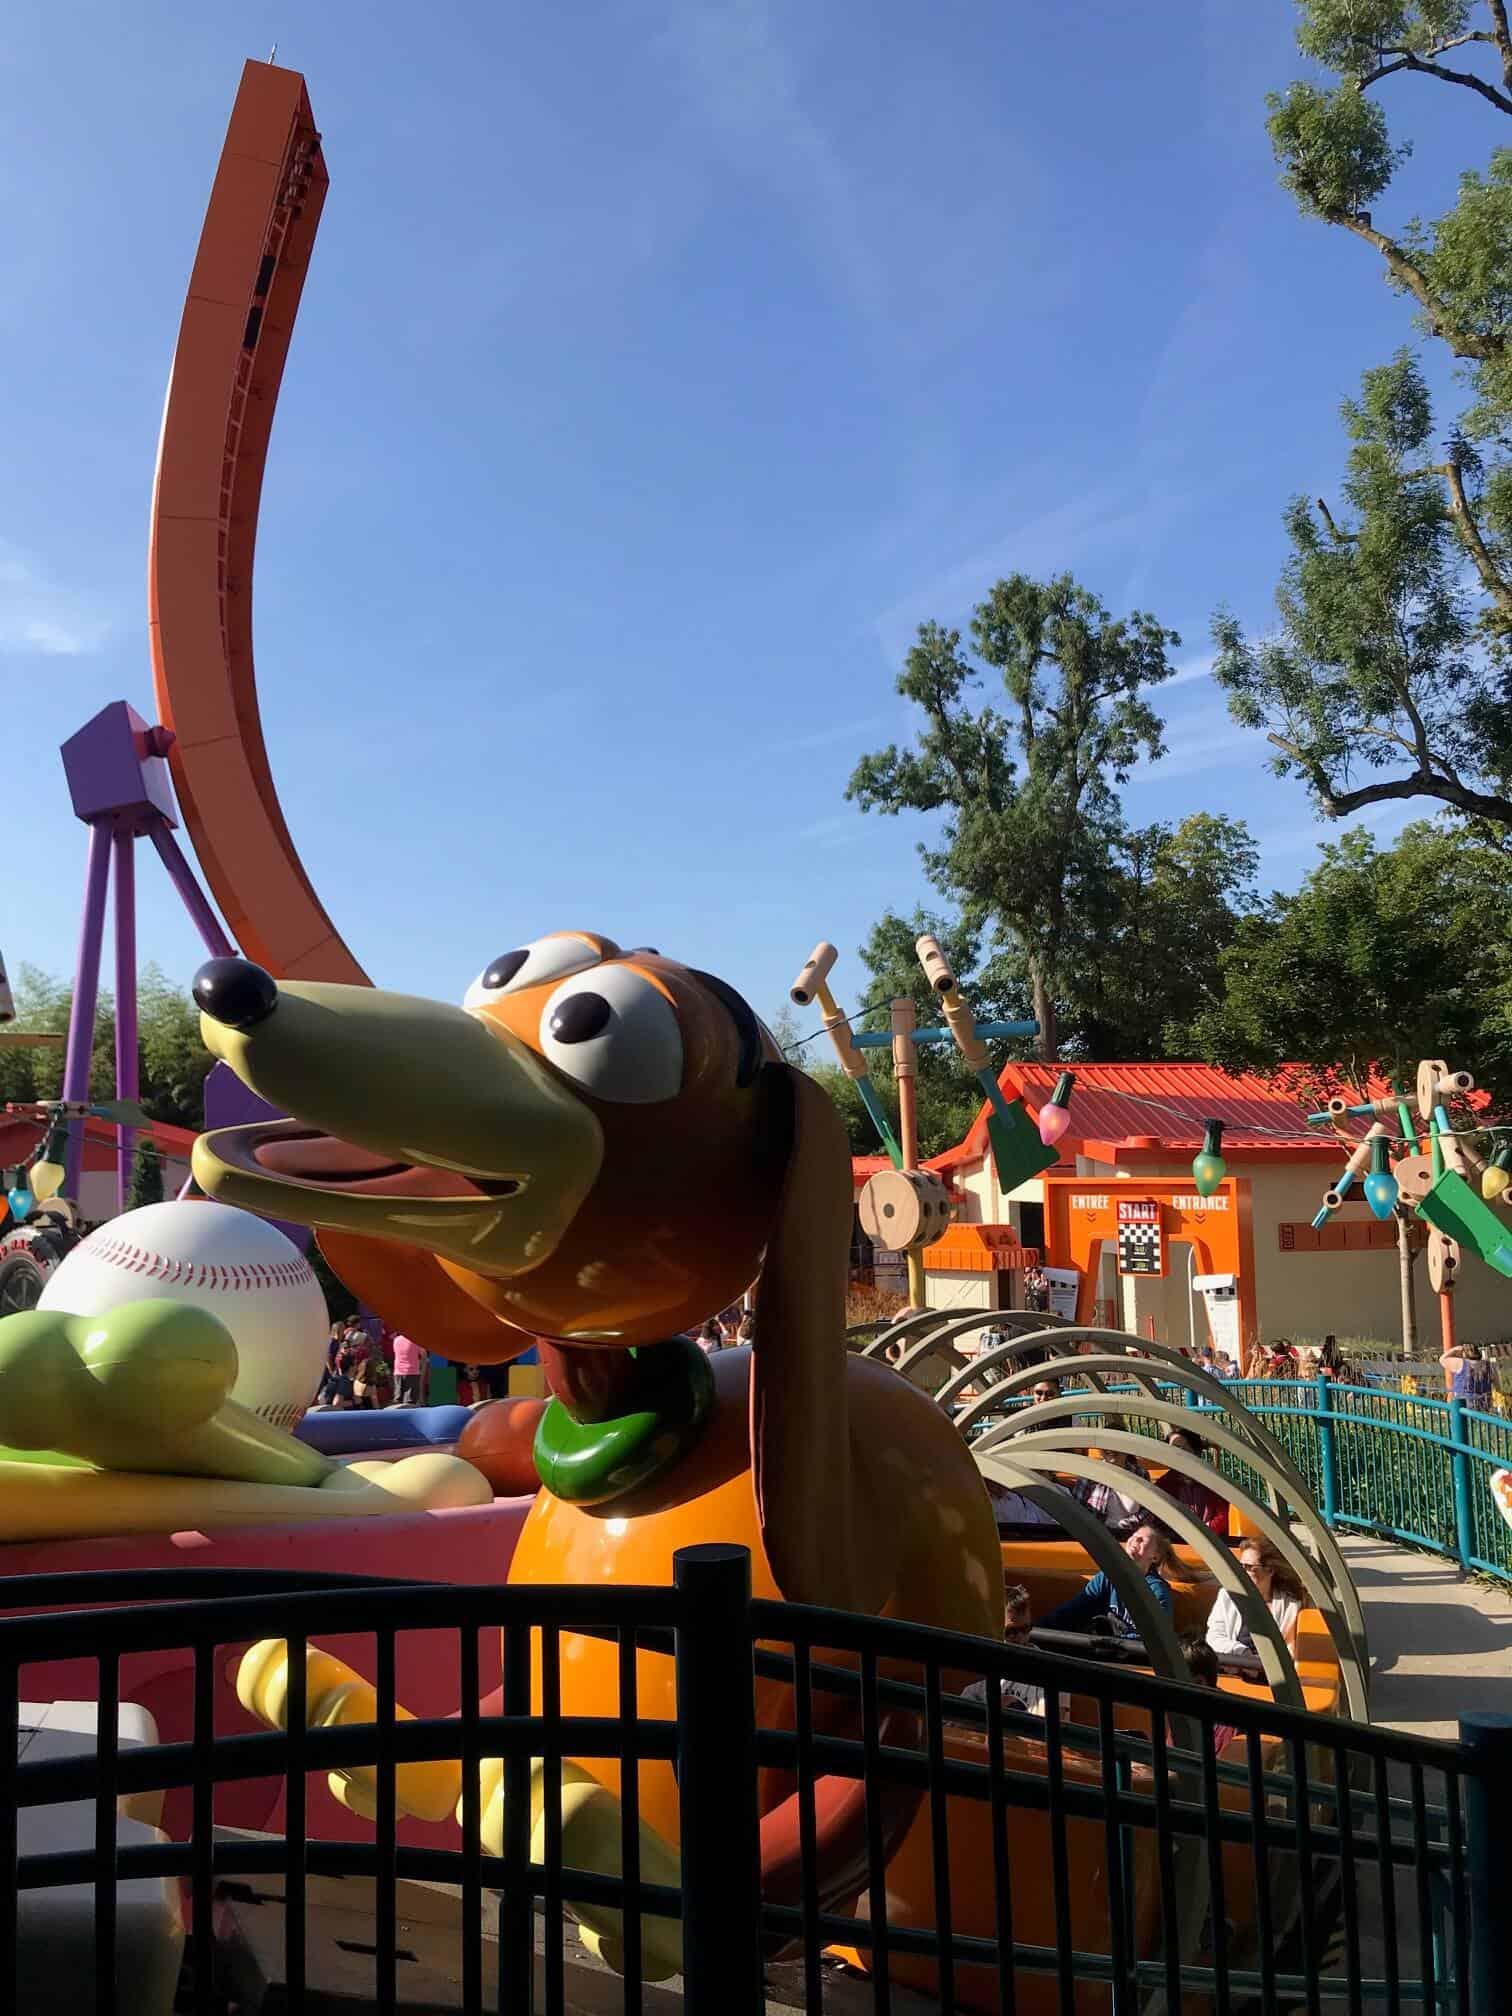 Slinky Dog Coaster - Best Things to do at Disneyland Paris Bucket List